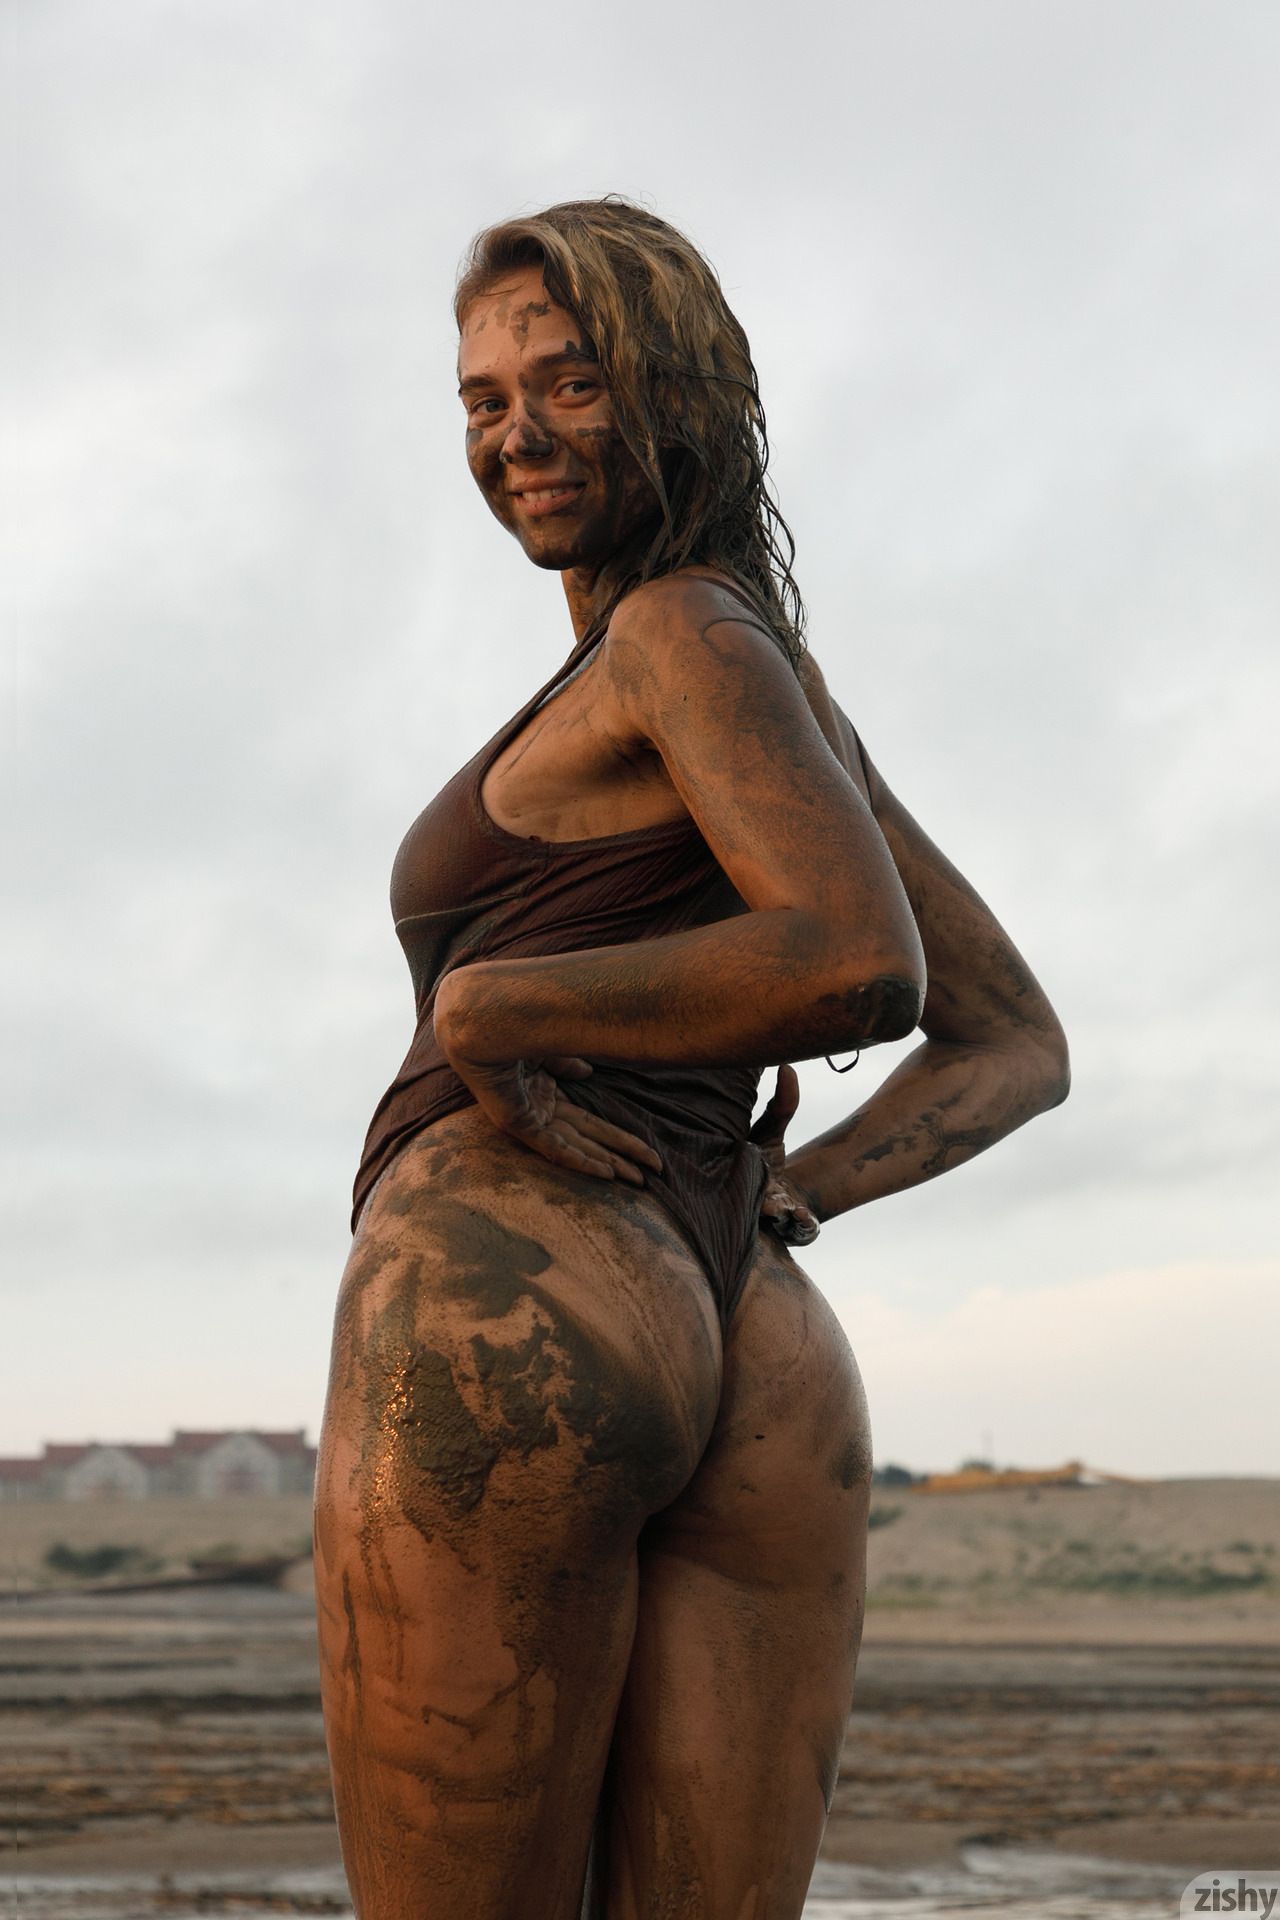 Sofia Orlova On Gryaznyy Beach Zishy (70)